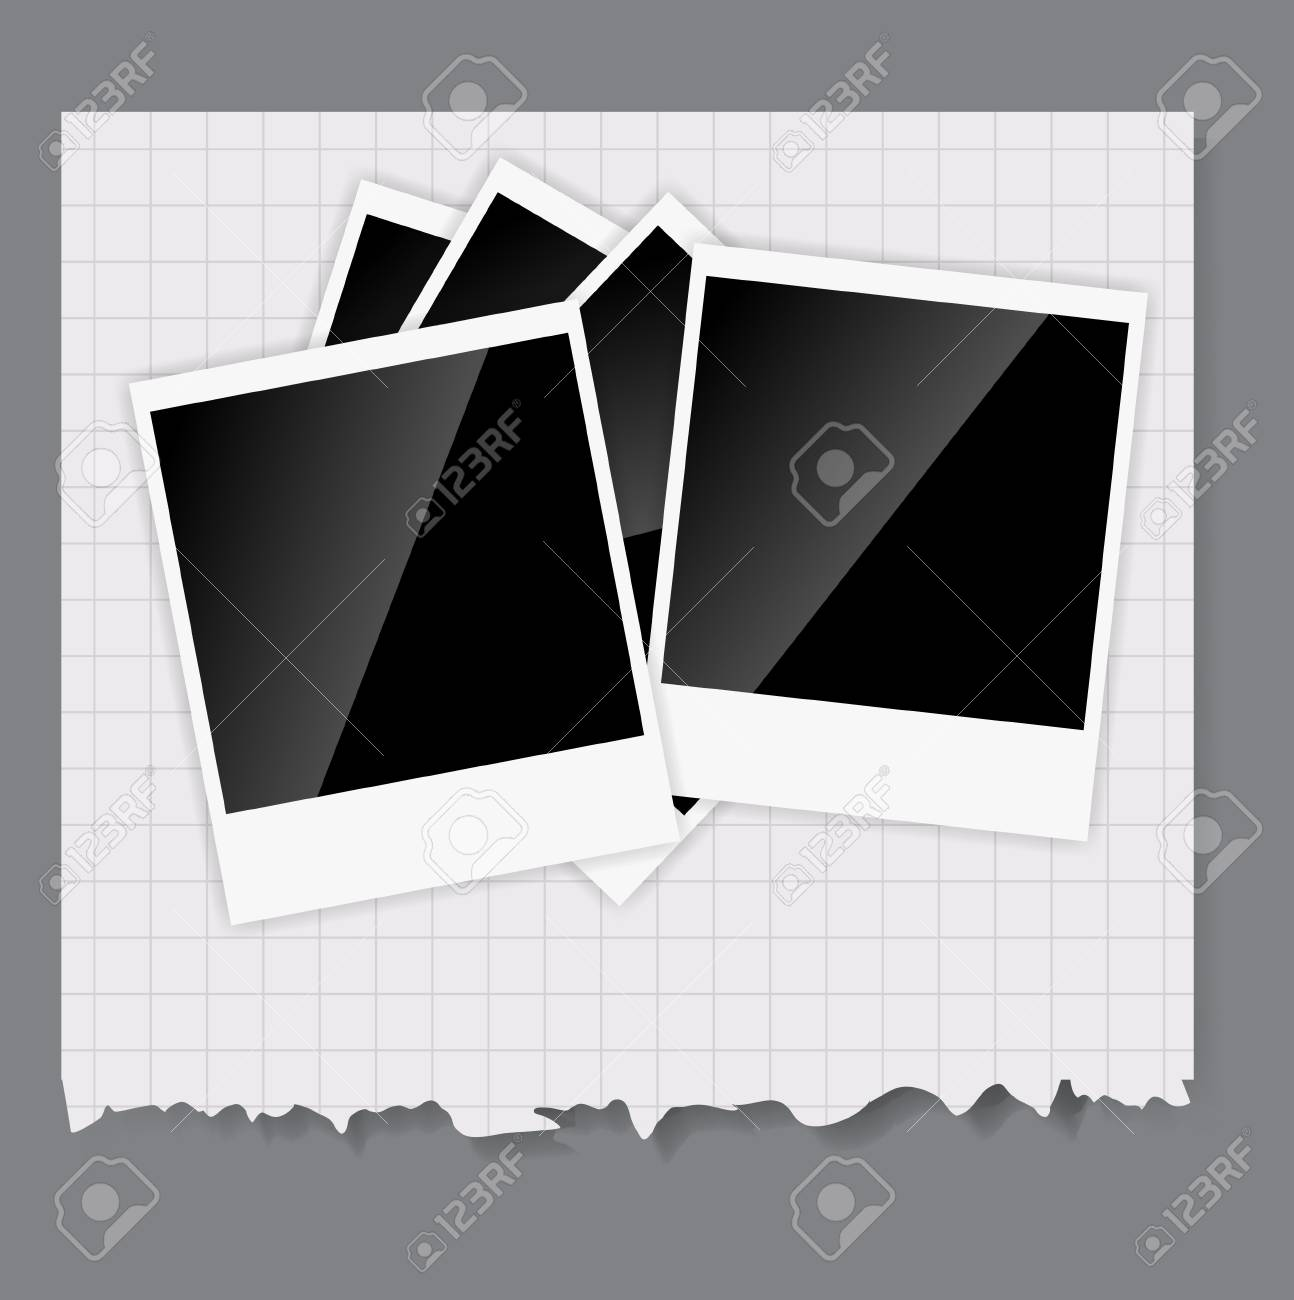 Camera, photos frame illustration Stock Vector - 20596488